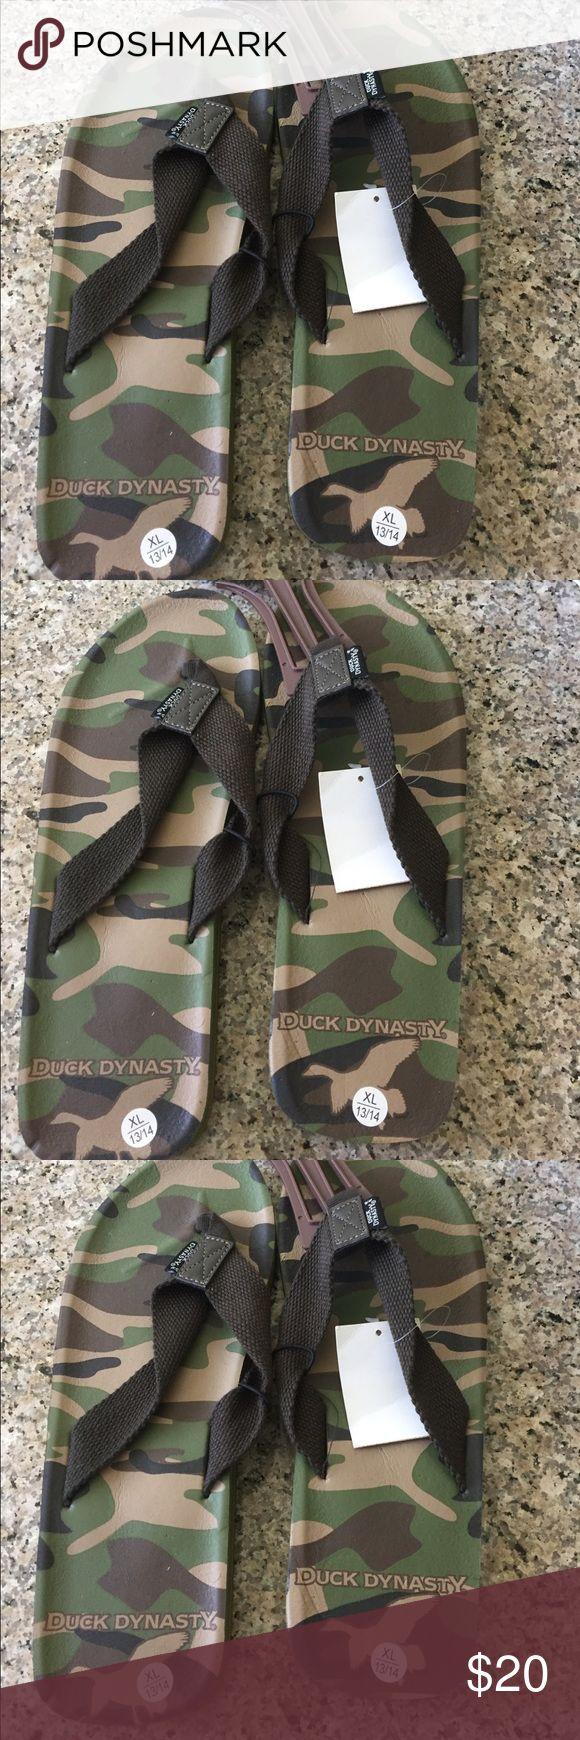 Duck Dynasty Slippers Men's Slippers Duck Dynasty Shoes Sandals & Flip-Flops